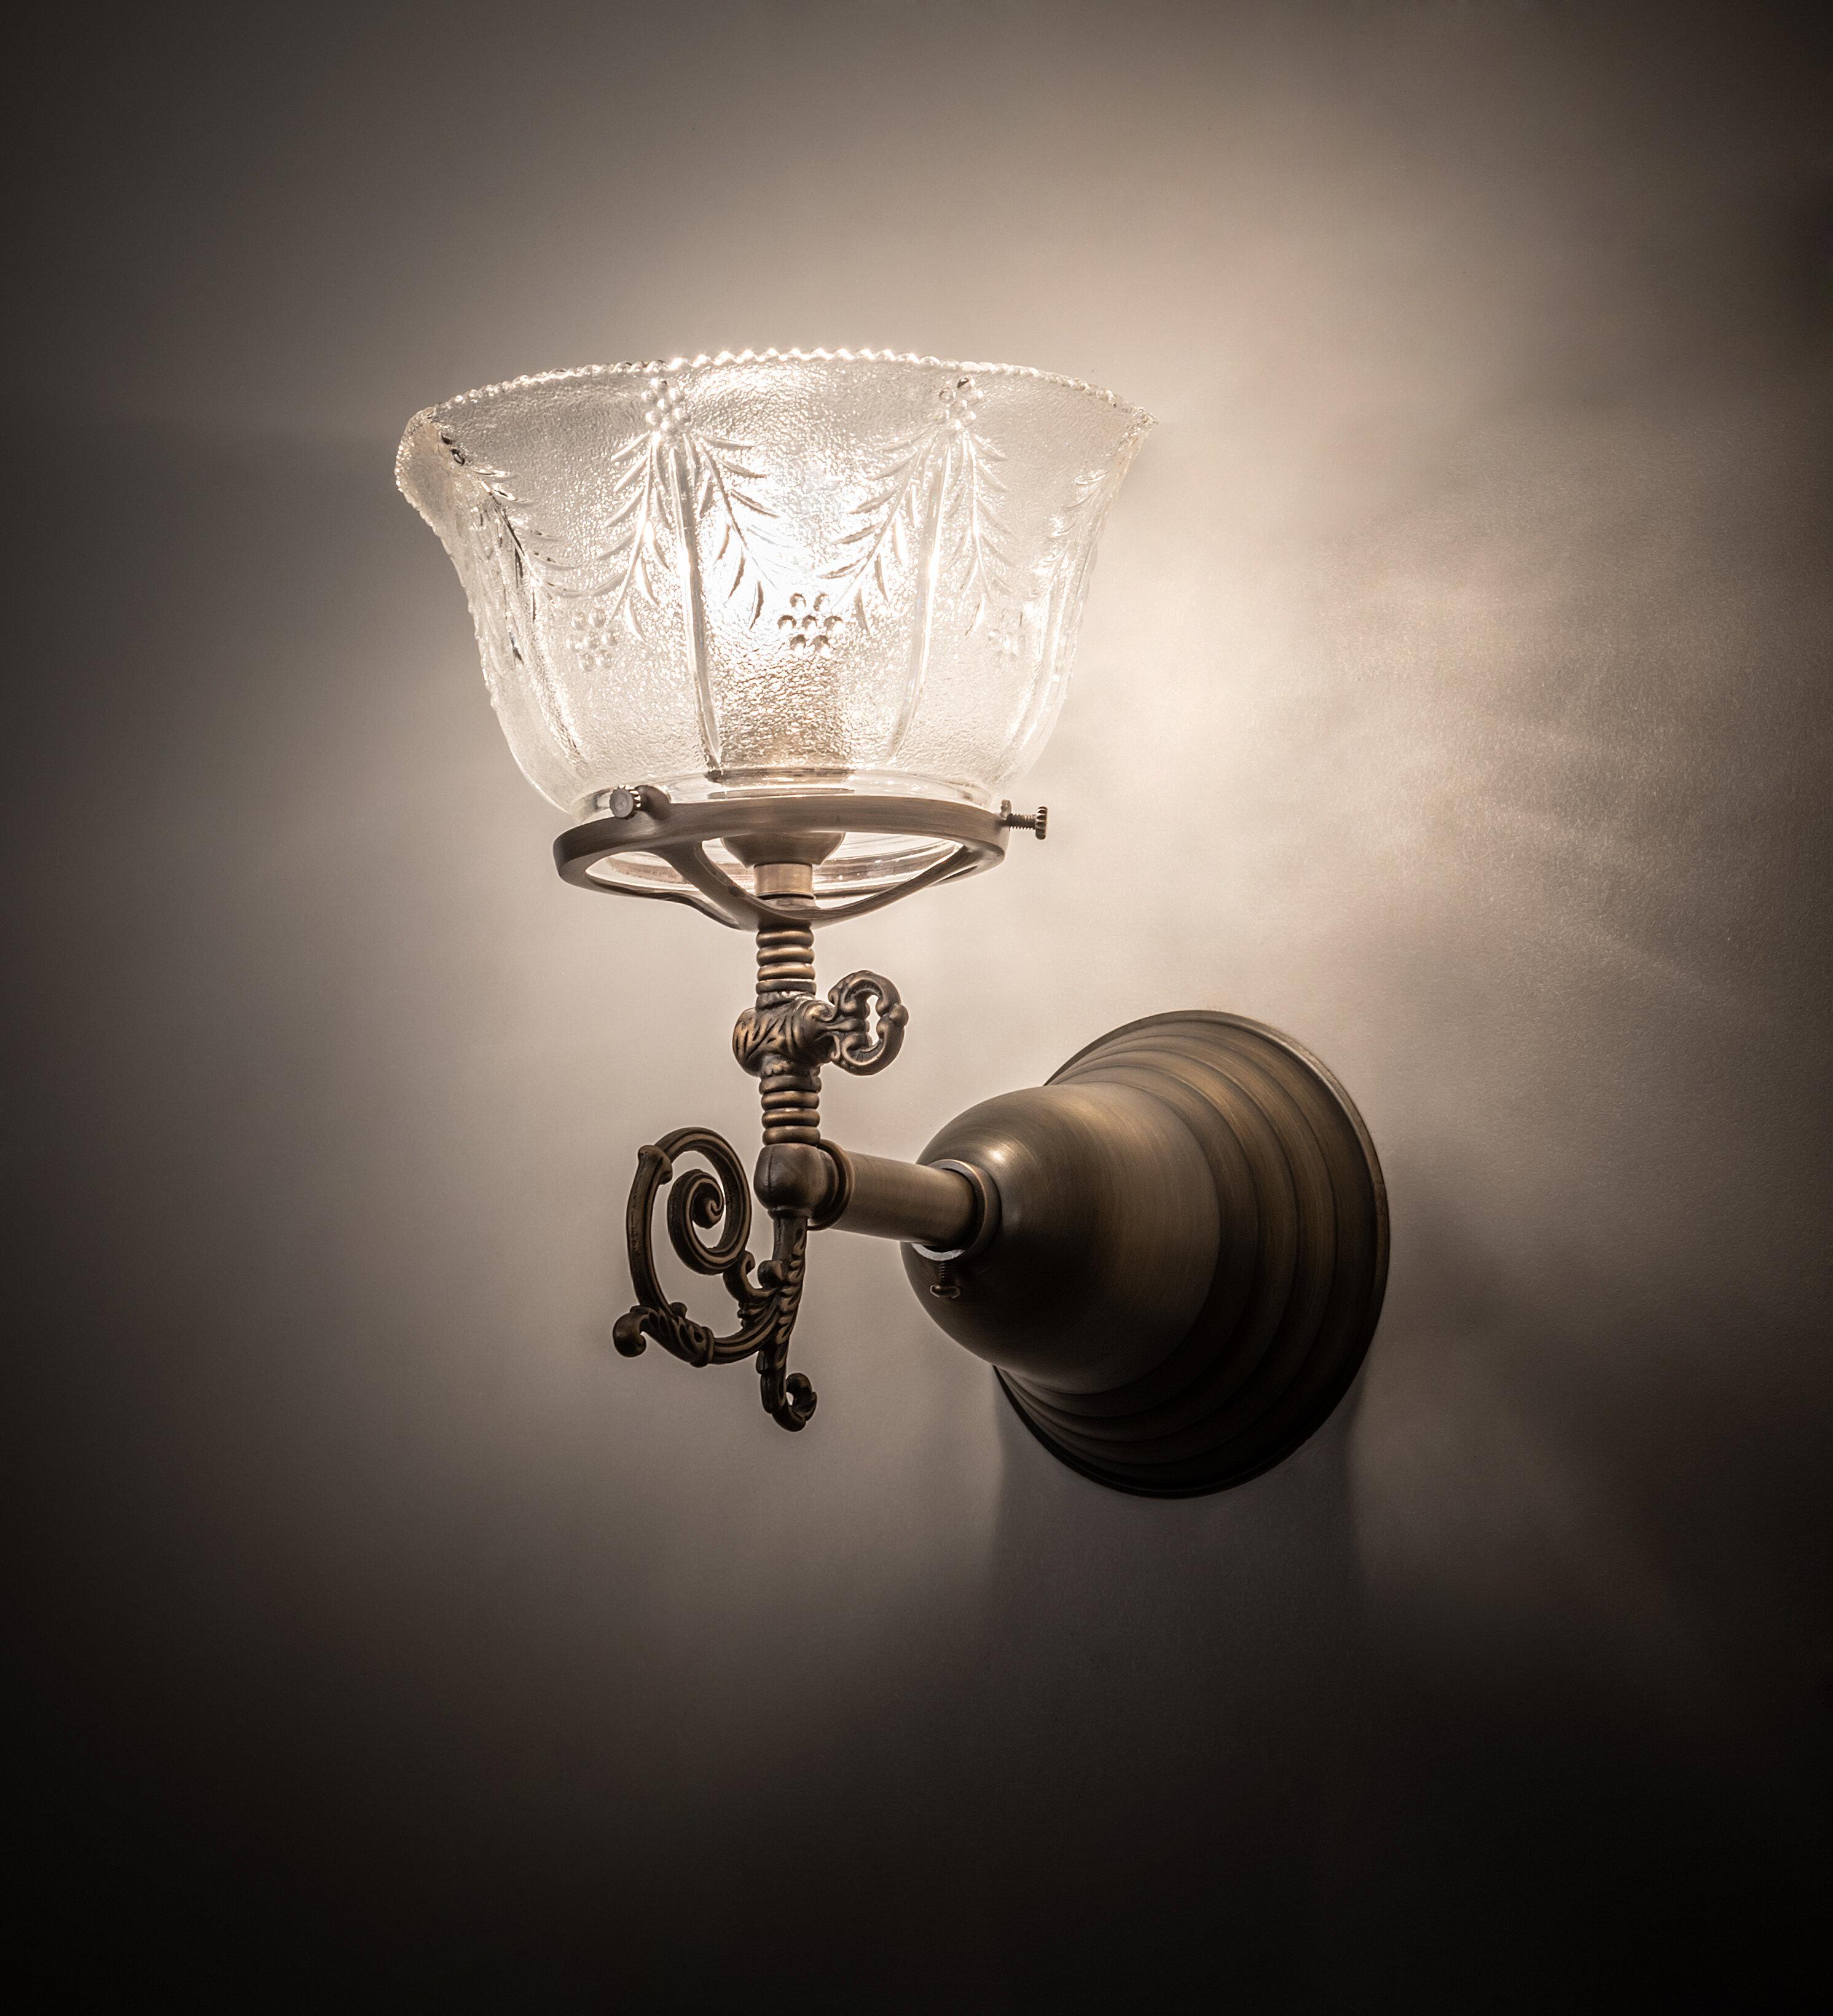 Meyda Tiffany 1-Light Revival Auburn Wheat Gas Wall Armed